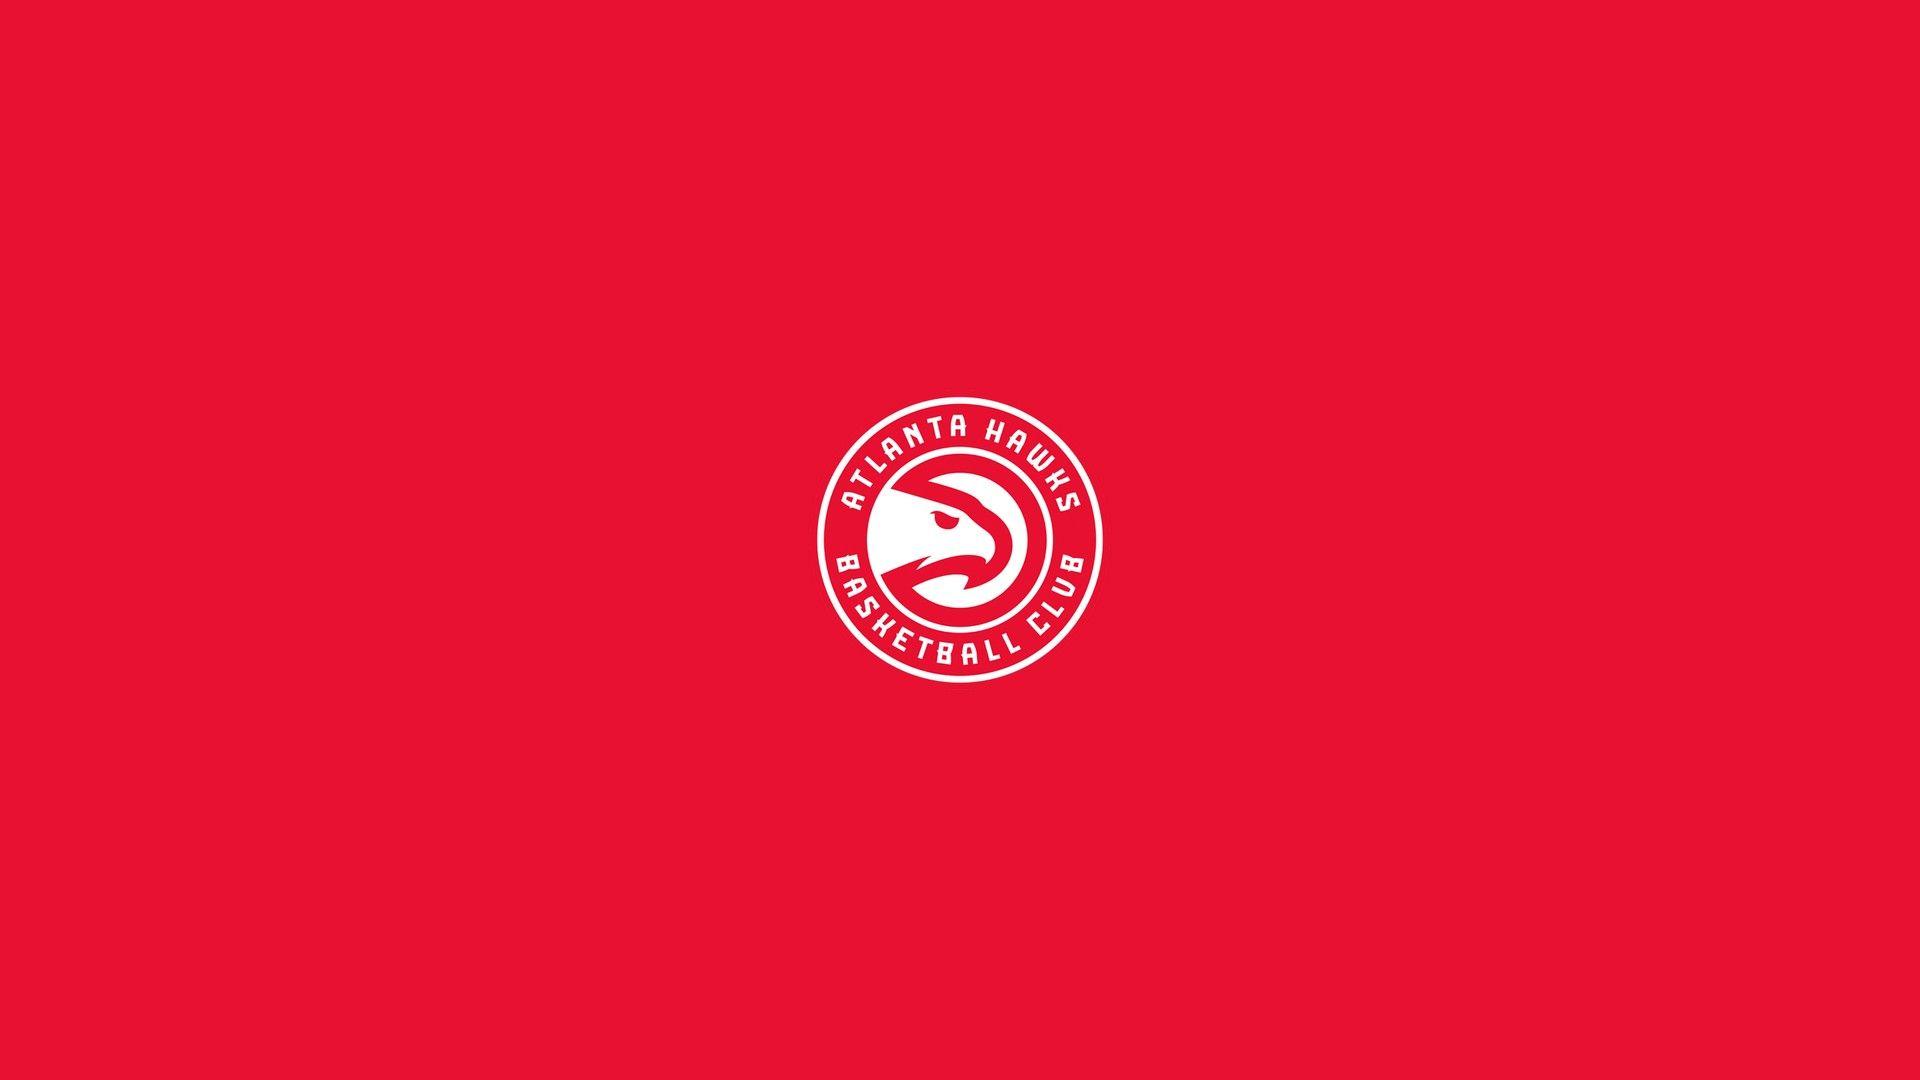 Backgrounds Atlanta Hawks Hd 2021 Basketball Wallpaper Basketball Wallpaper Atlanta Hawks Basketball Wallpapers Hd